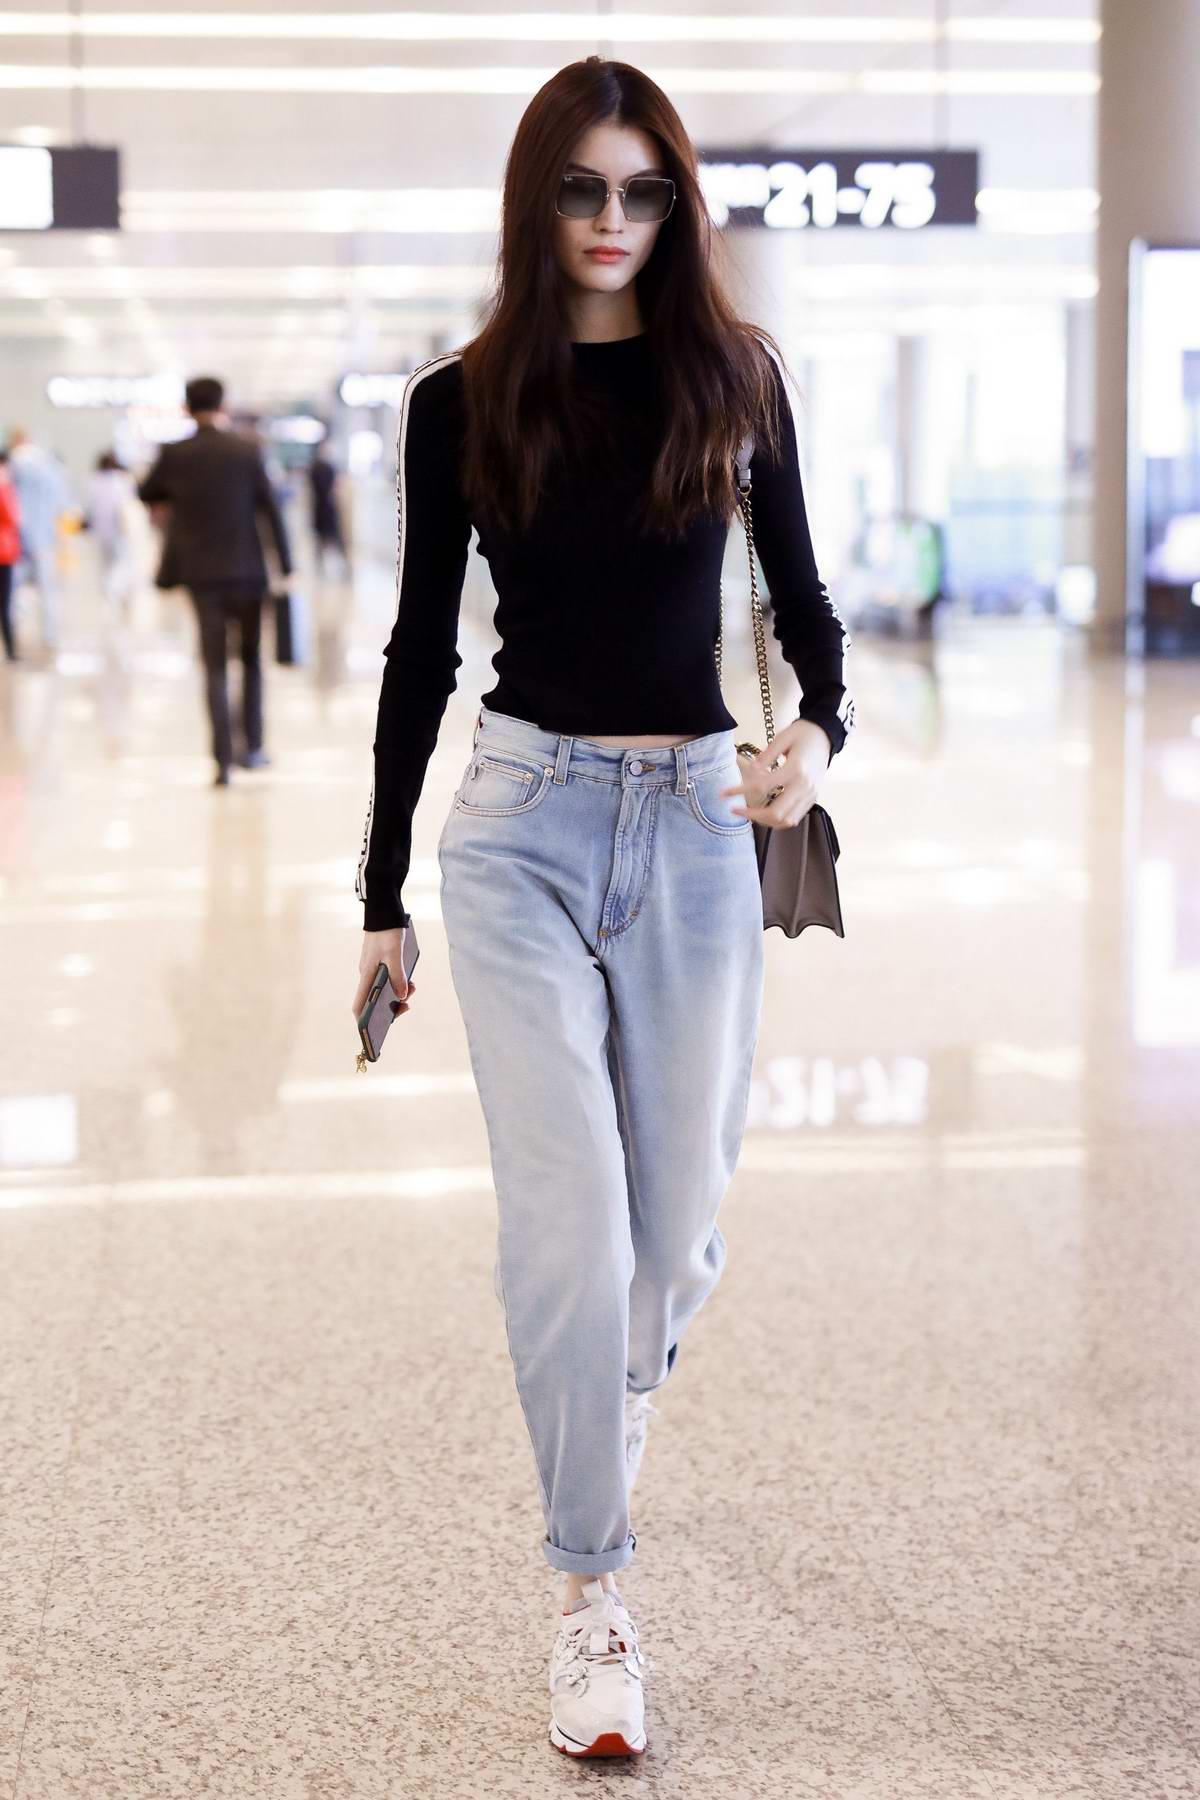 Sui He rocks a black Fiorucci top as she arrives at Shanghai Hongqiao Airport in Shanghai, China